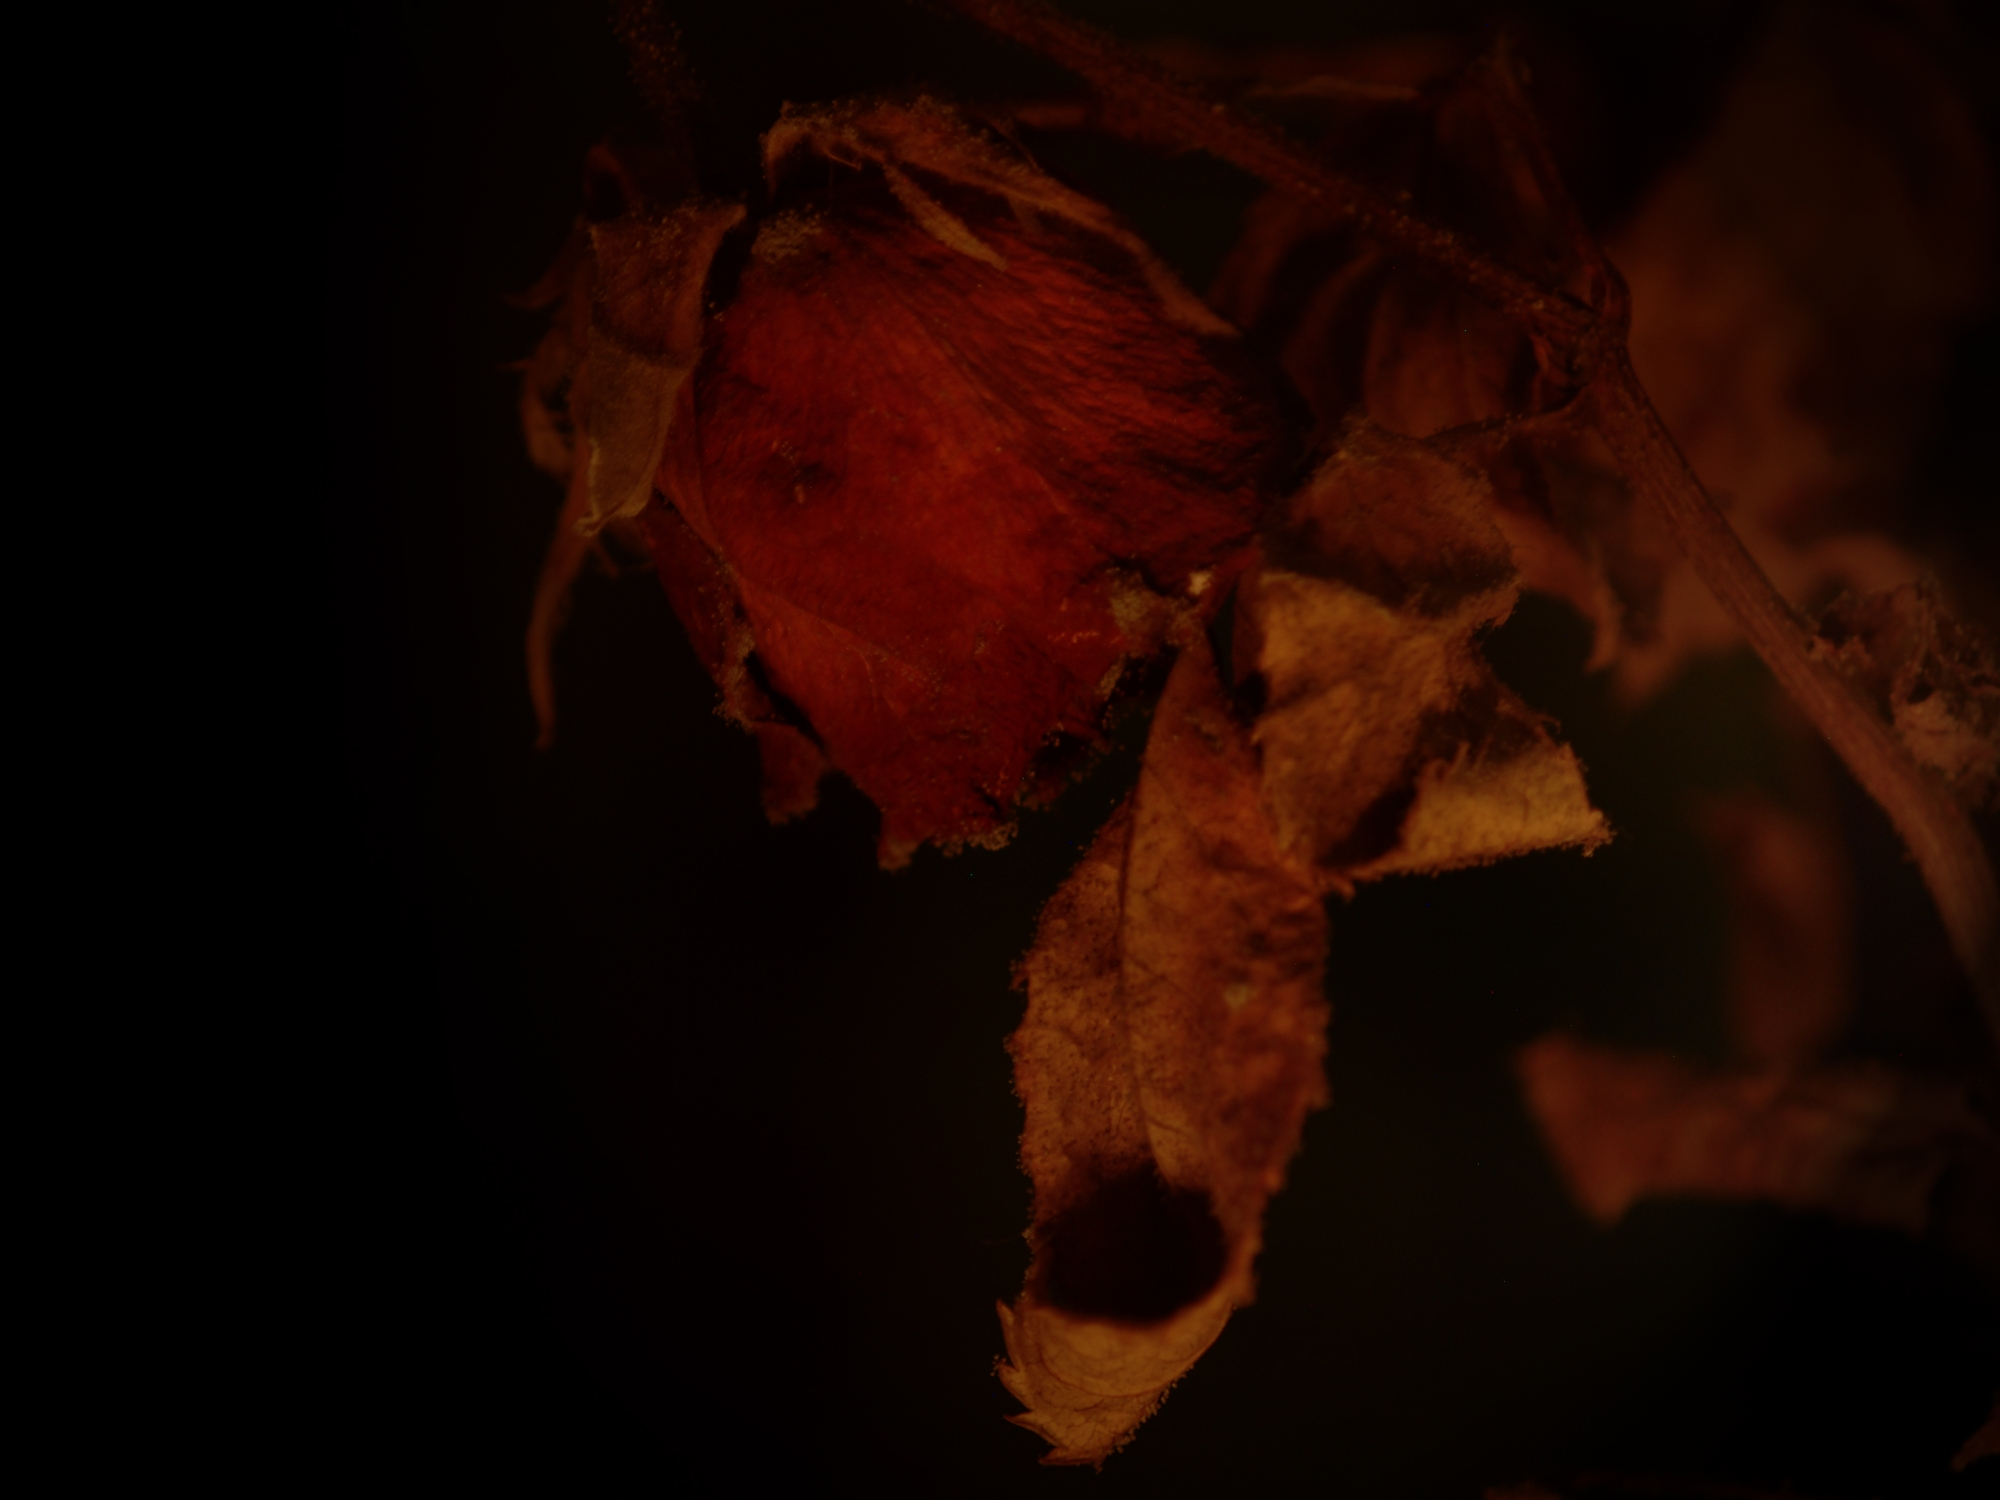 Some Rose